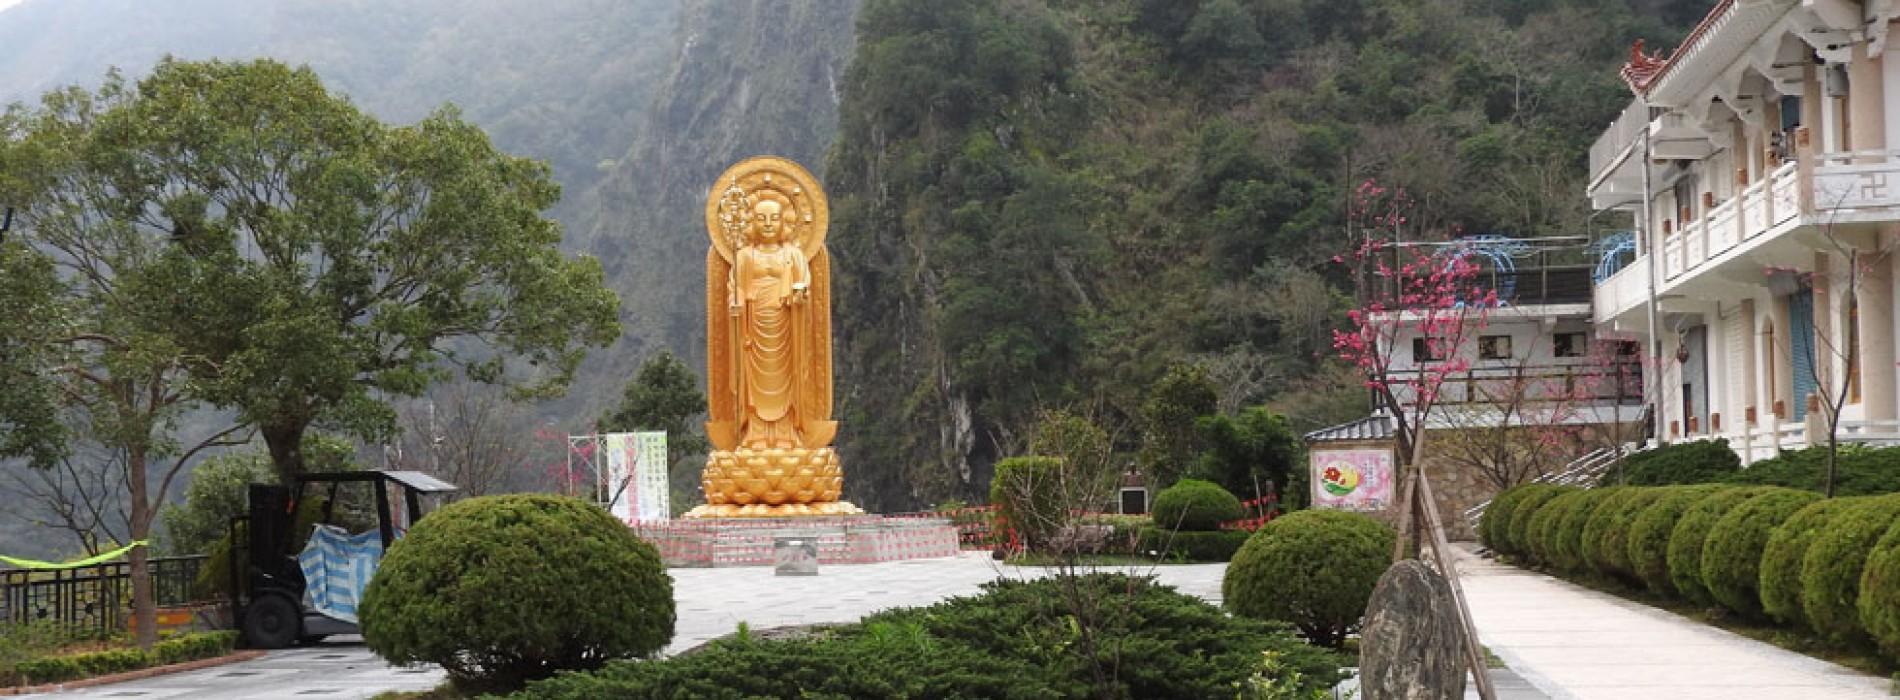 Taiwan: an idyllic country to visit